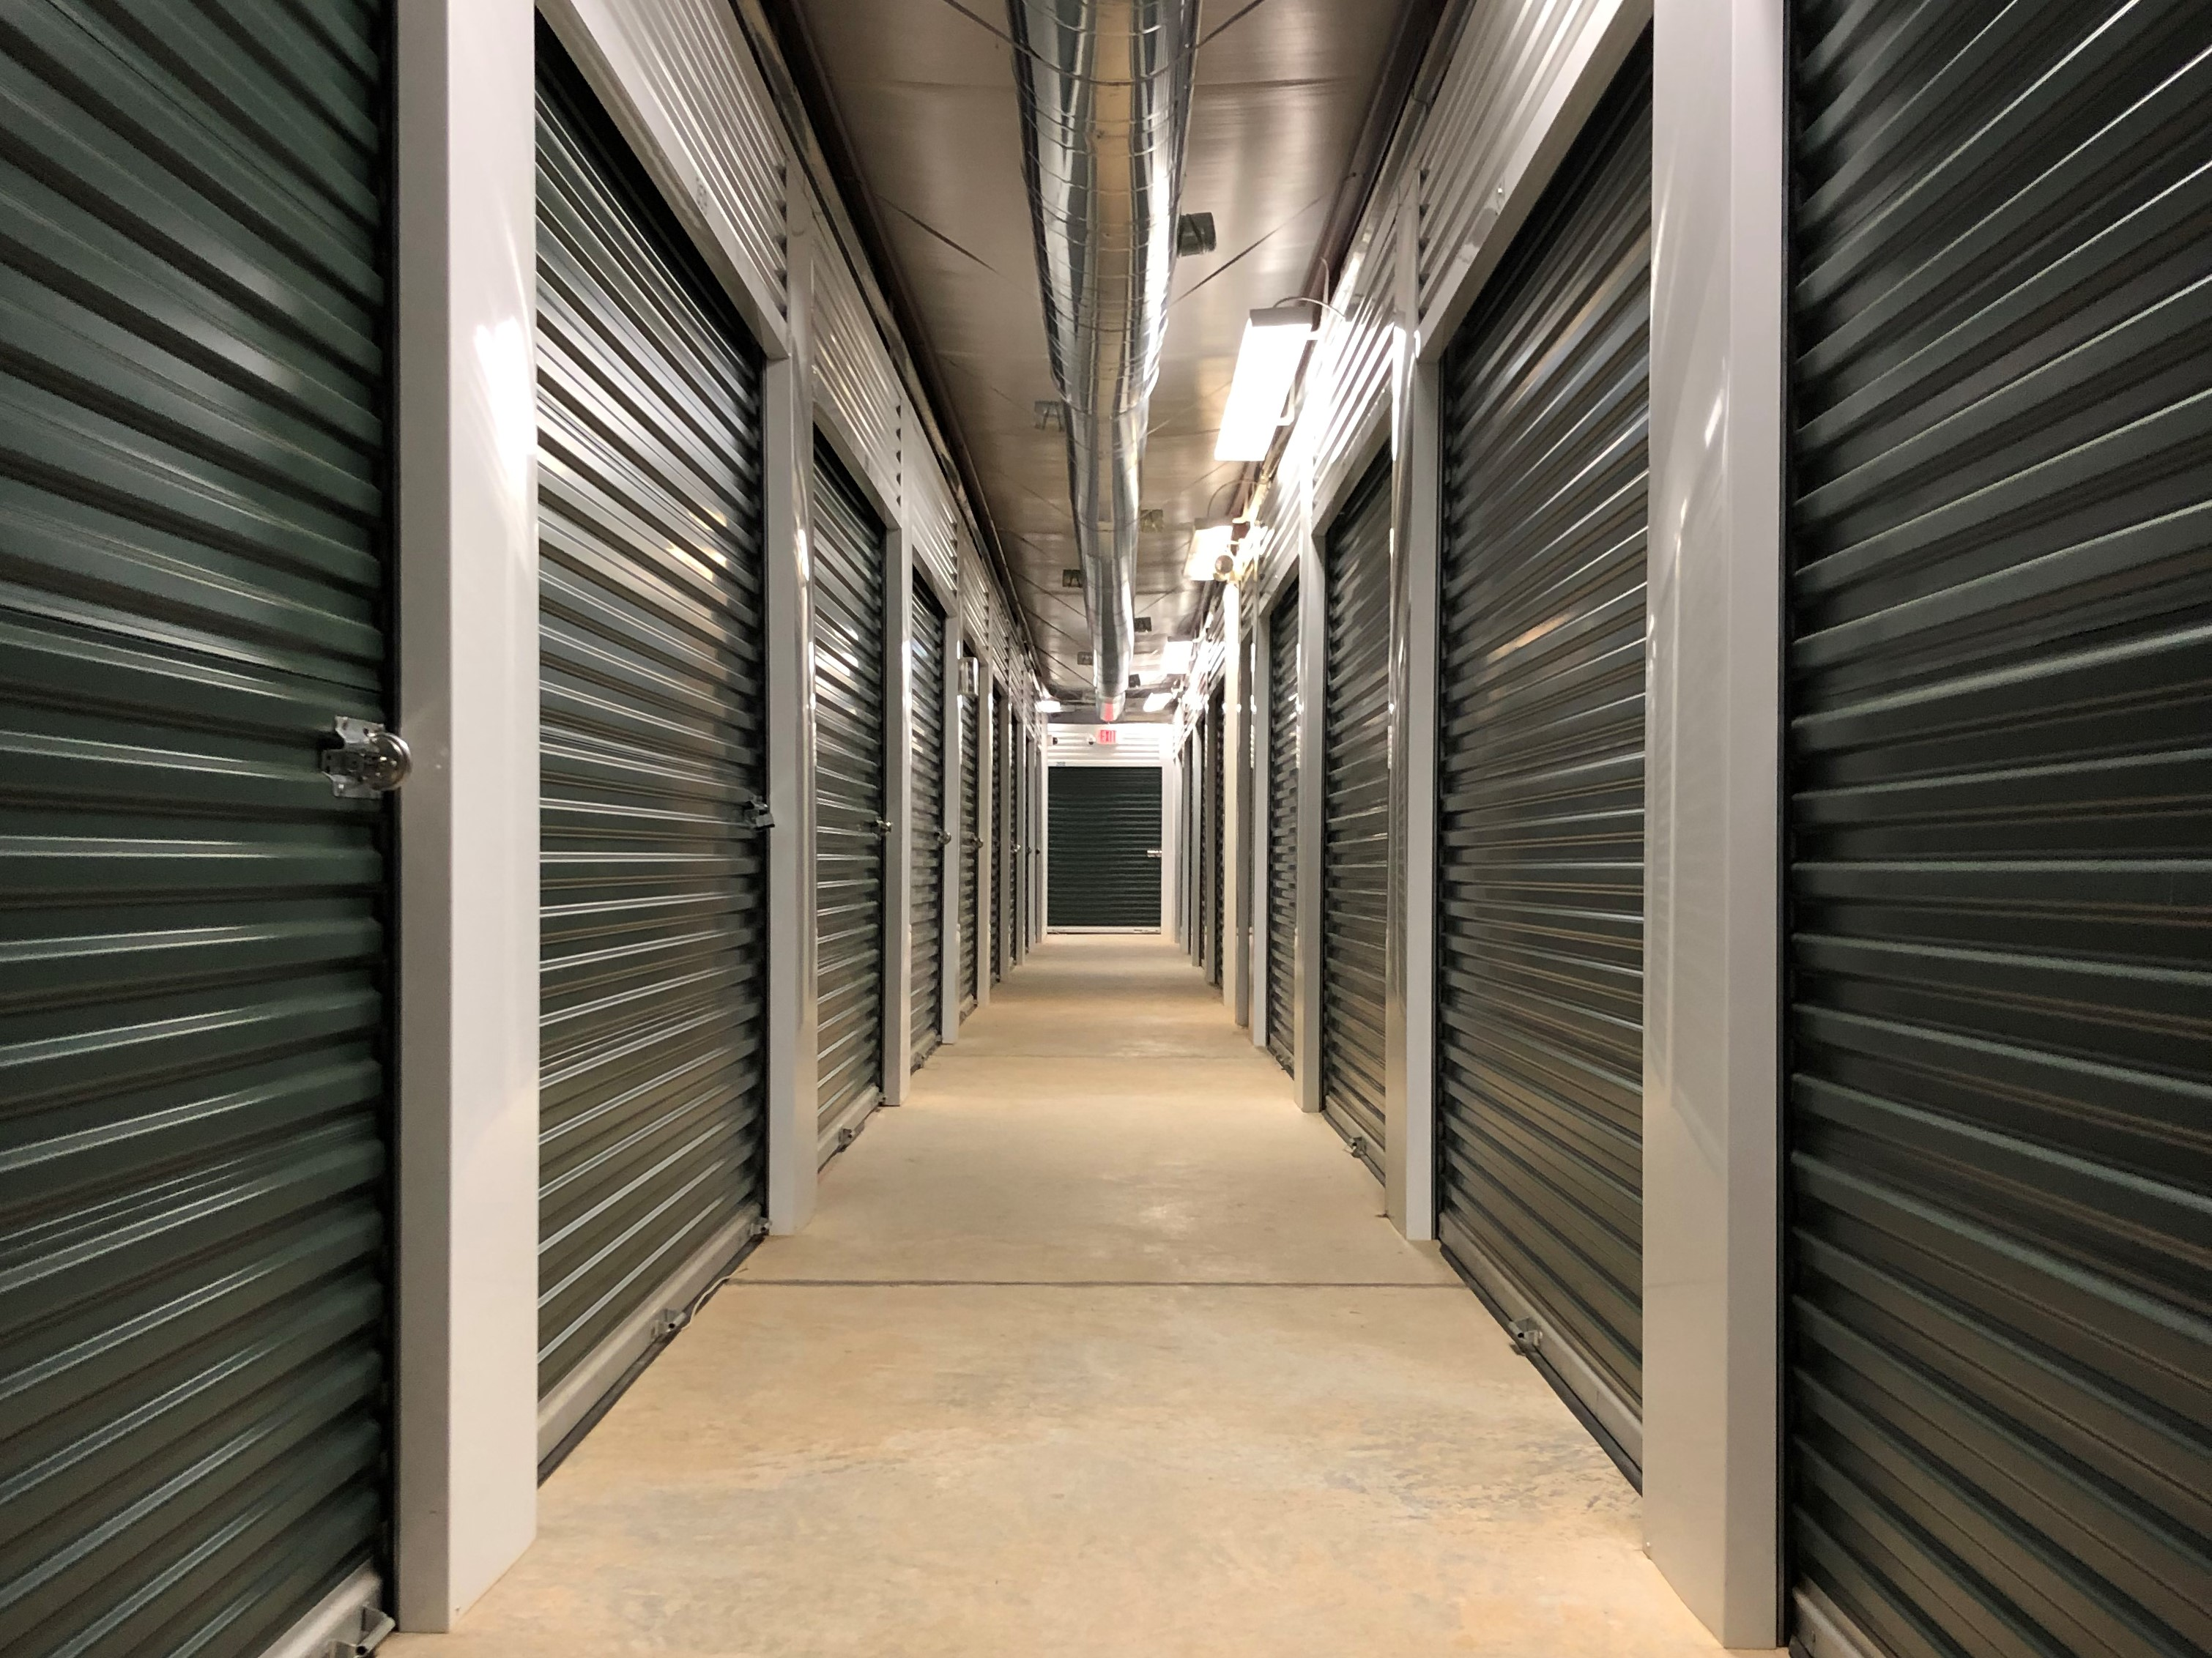 hallway of interior access storage units